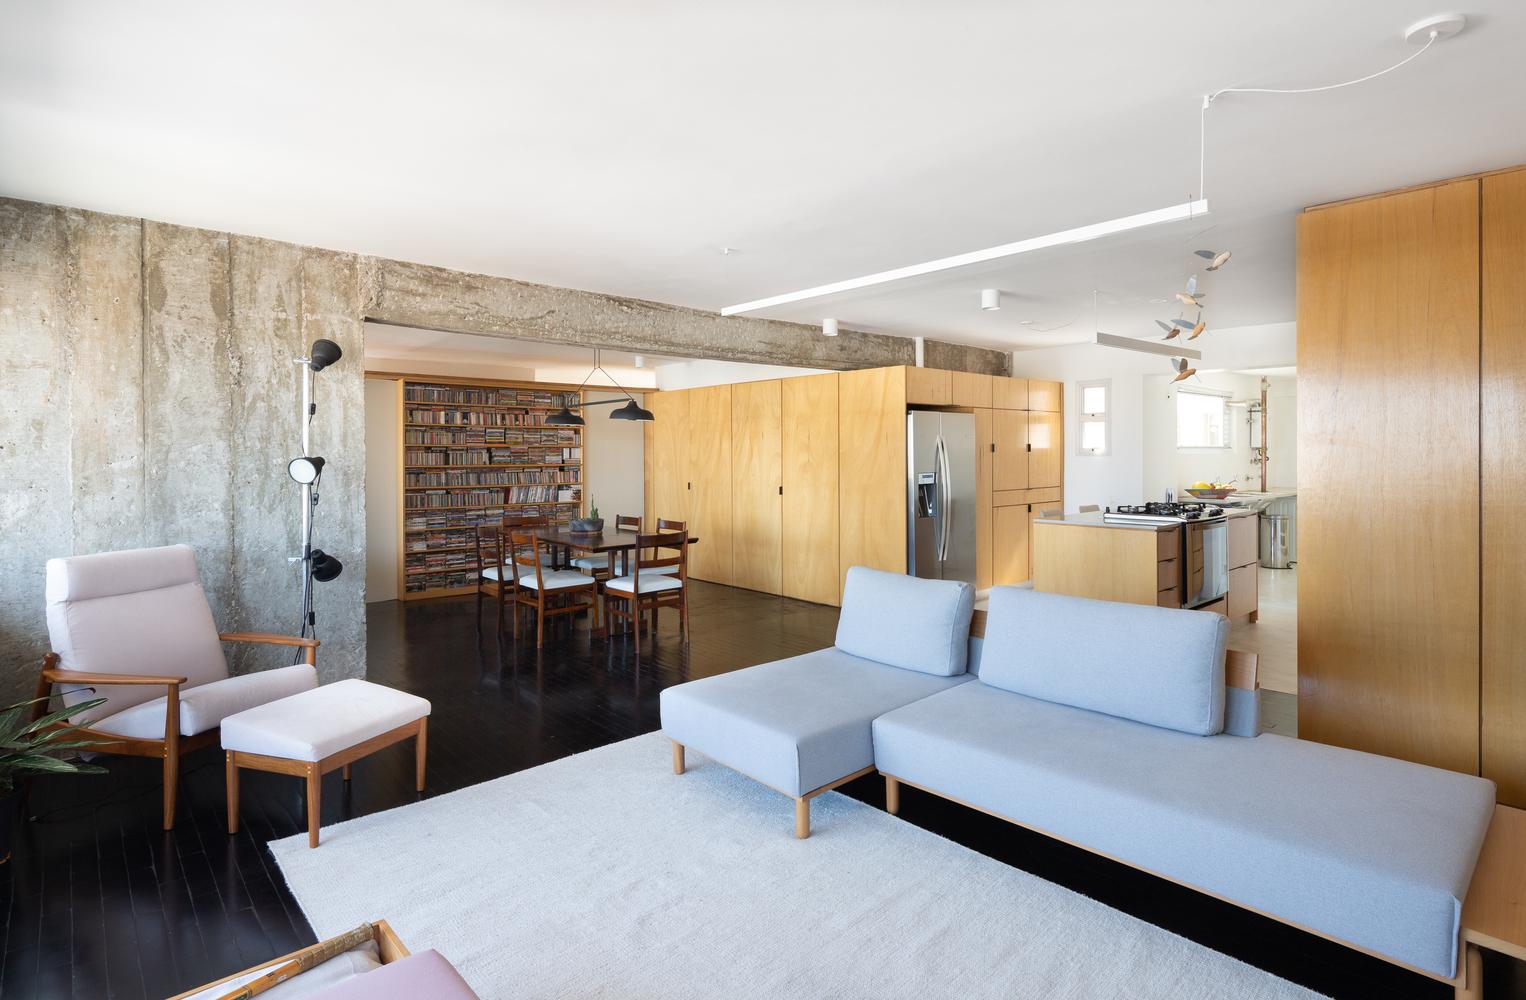 Apartment Renovation in Mooca Neighbourhood / Firma + Oitentaedois